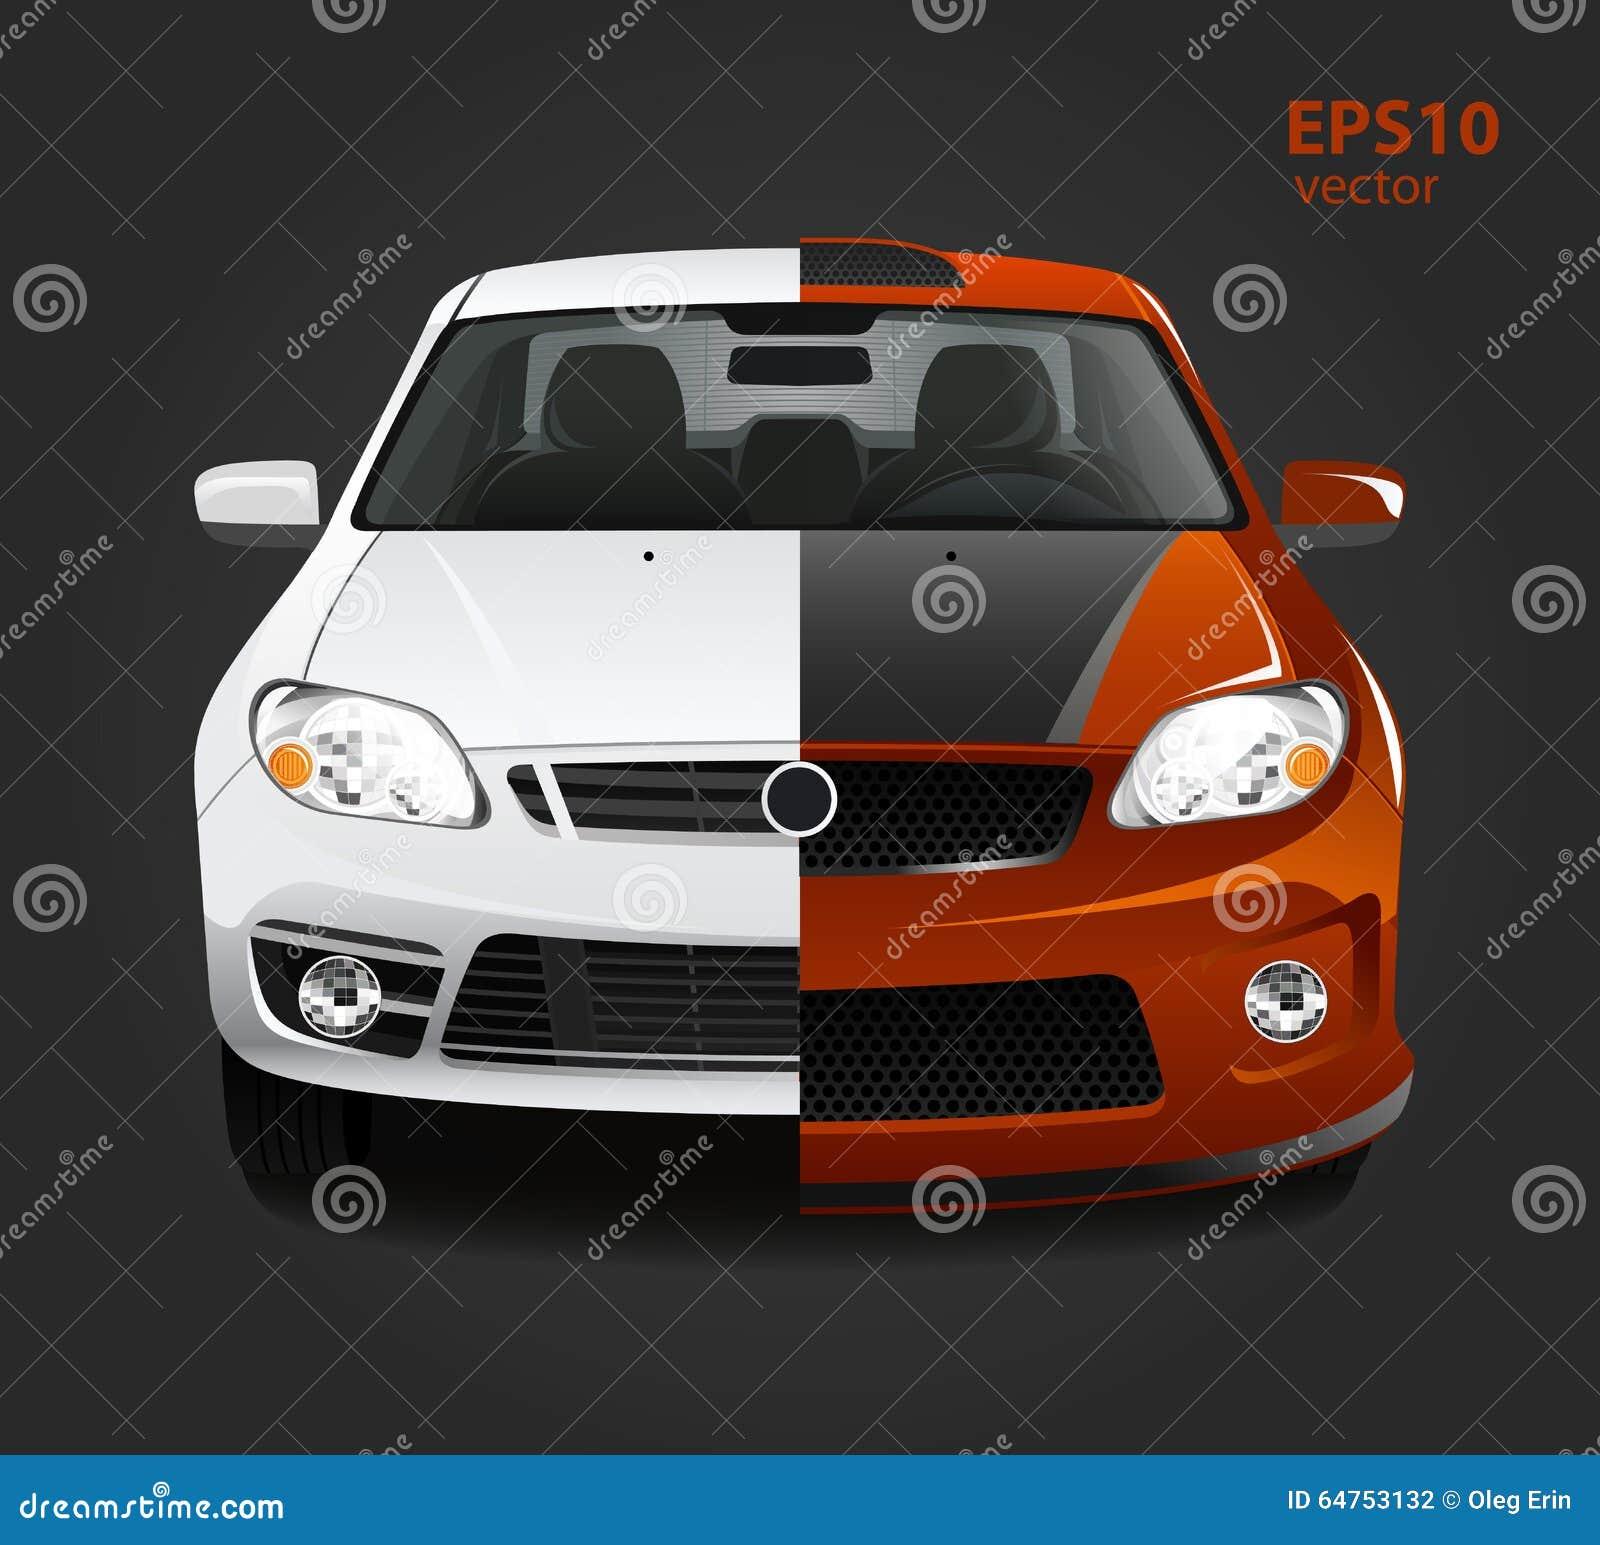 Car Tuning Stock Vector Image 64753132